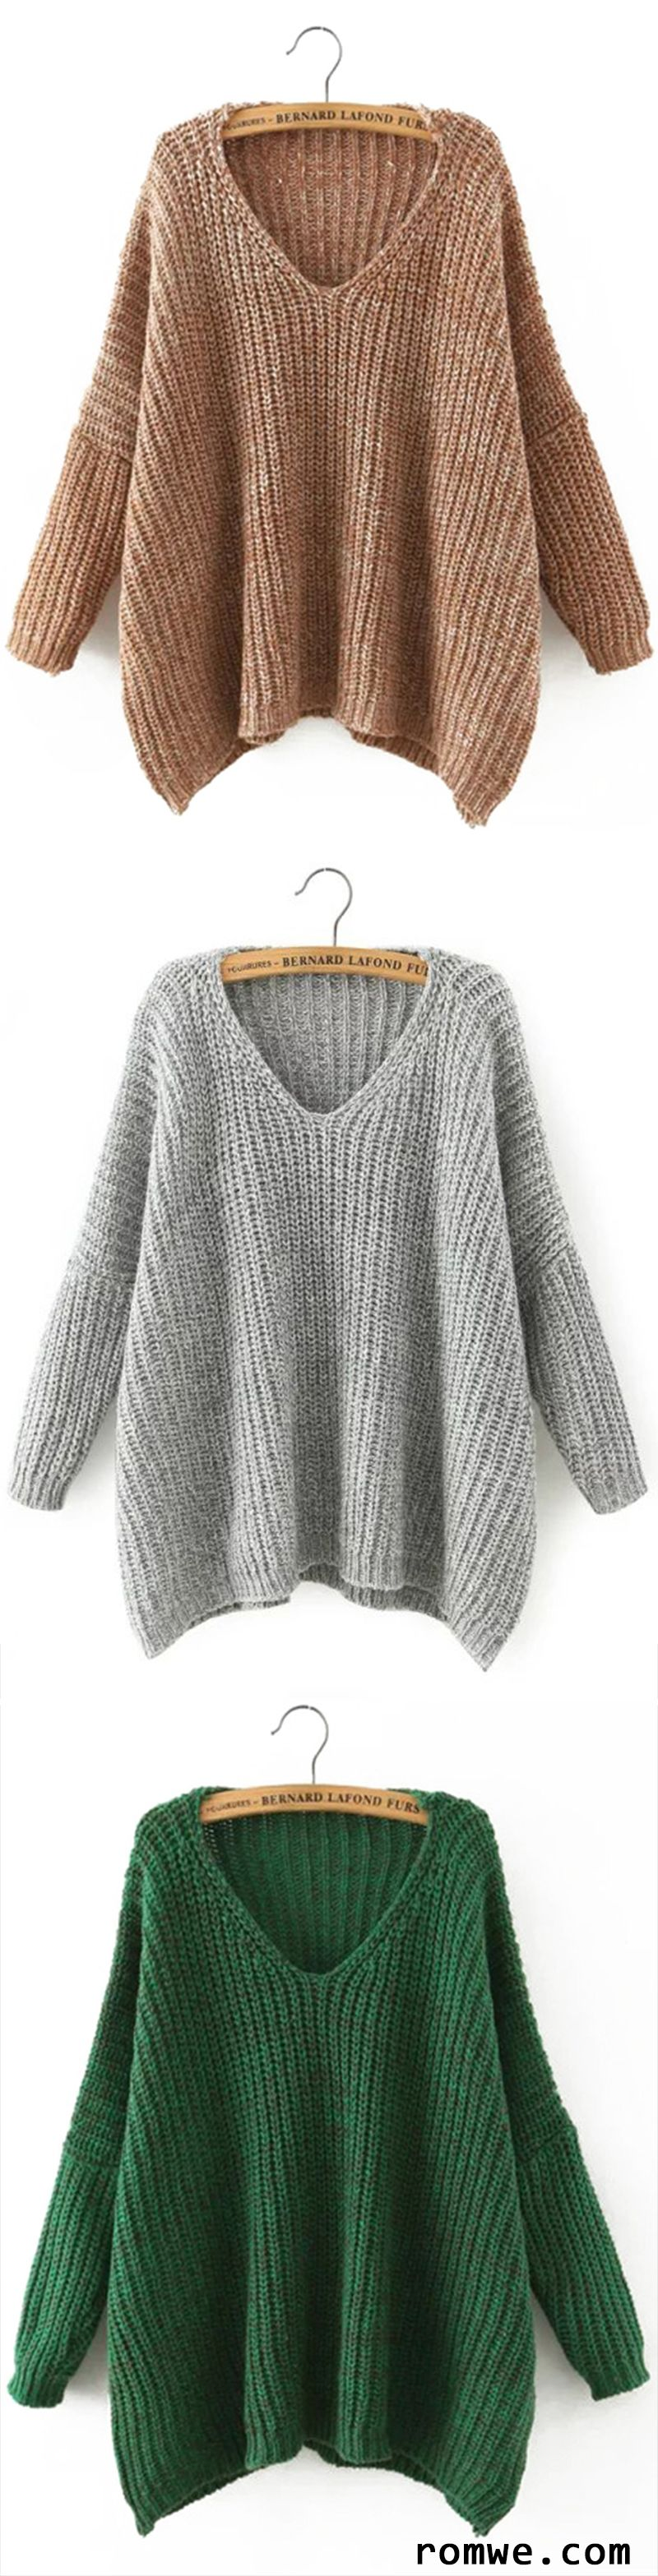 V Neck Batwing Sleeve Loose Sweater | Romwe Hot Buy | Pinterest ...